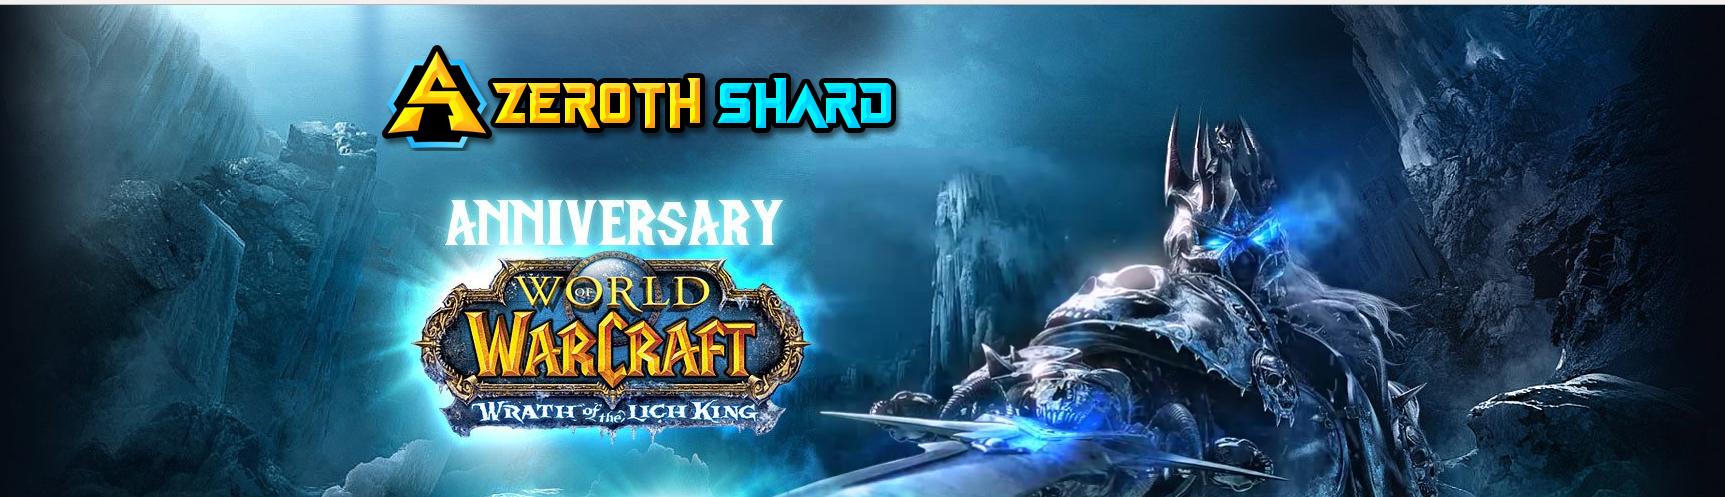 AzerothShard festeggia l'anniversario